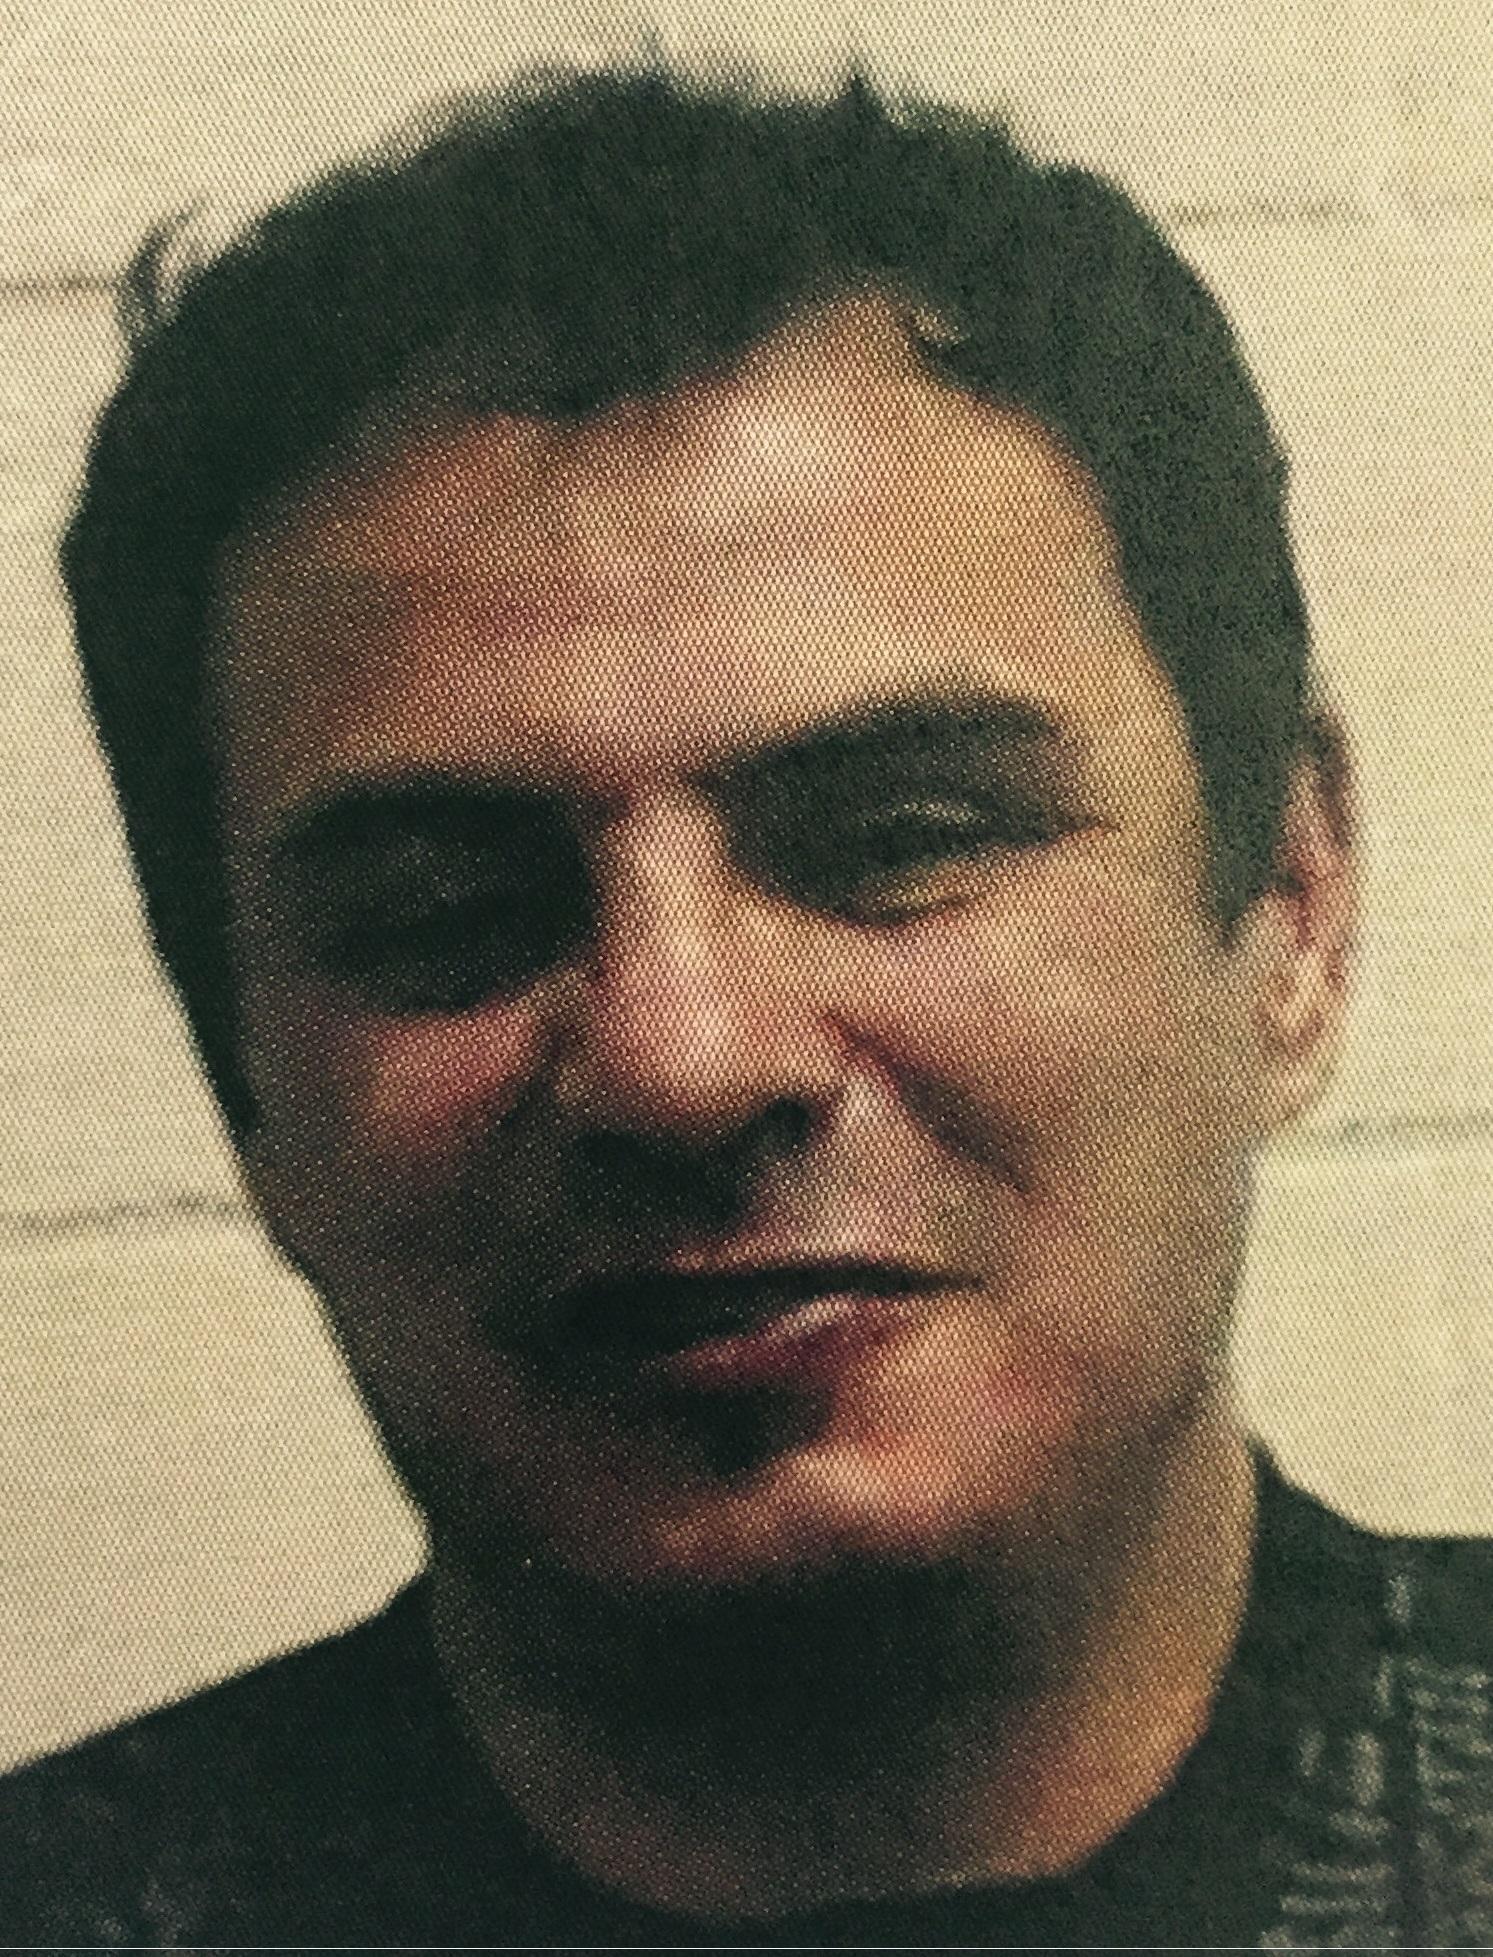 Update: 37-Year-Old Missing Man Found Safe